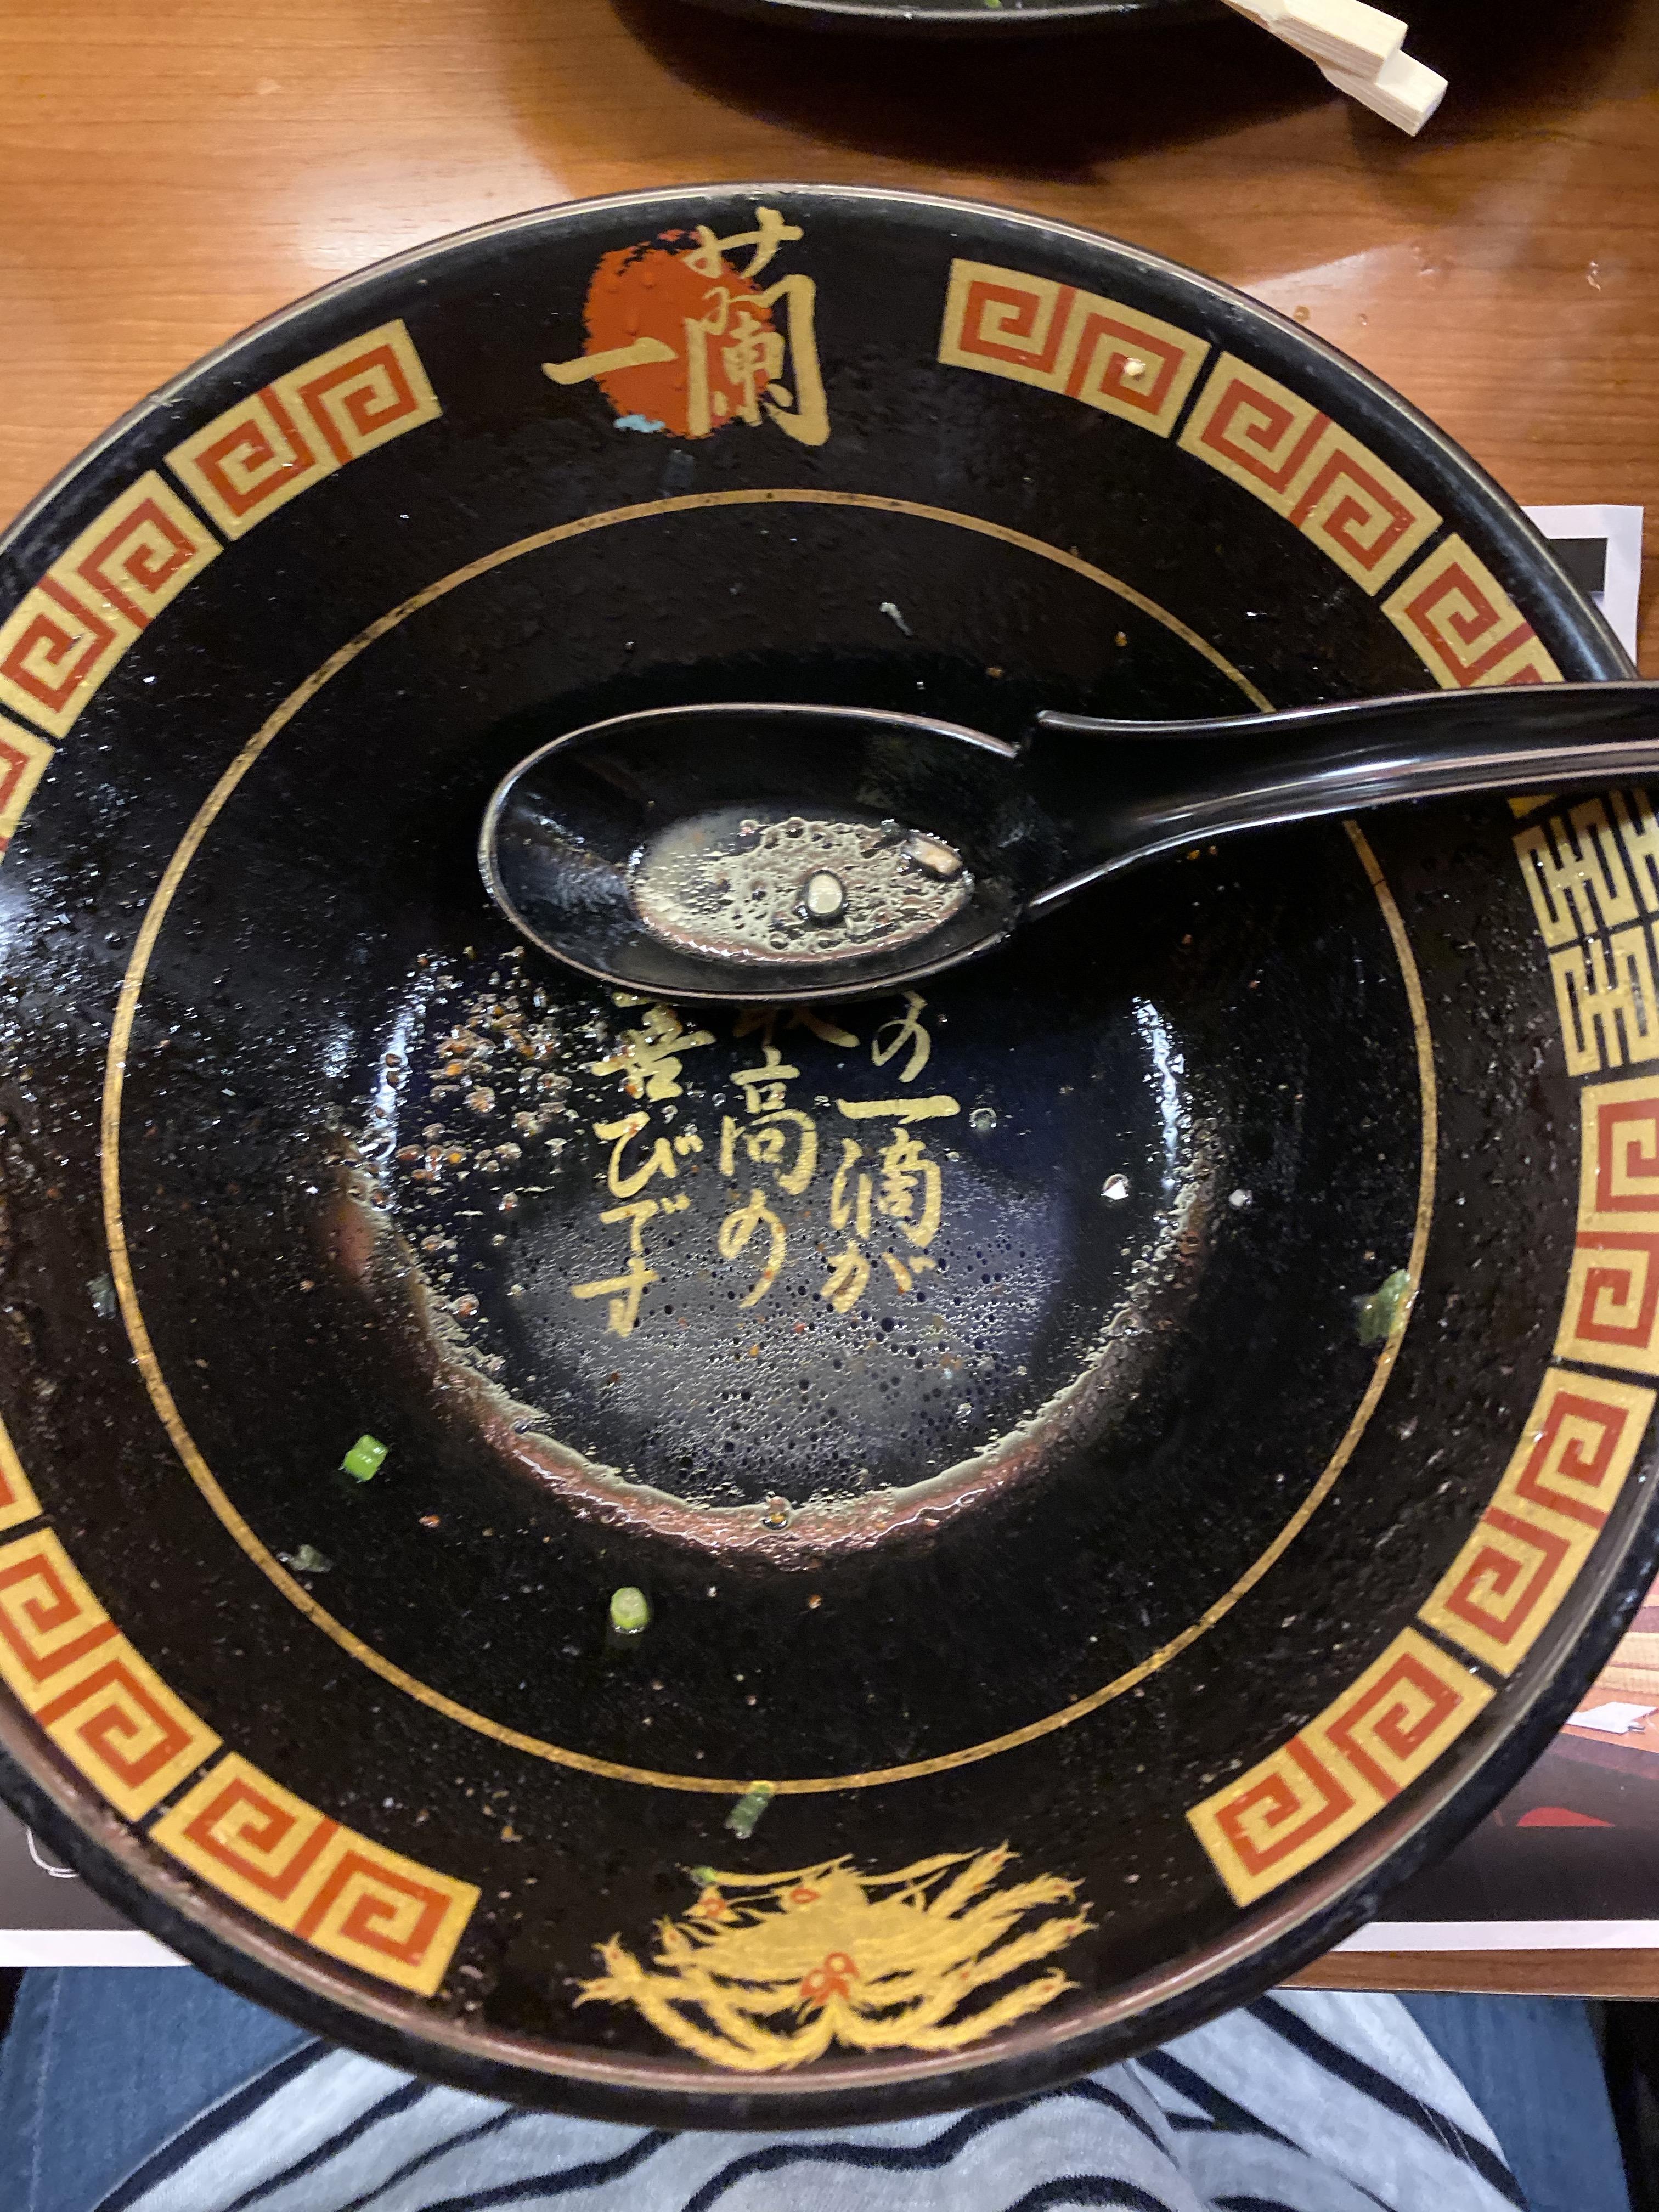 Ichiran Ramen Bowl empty